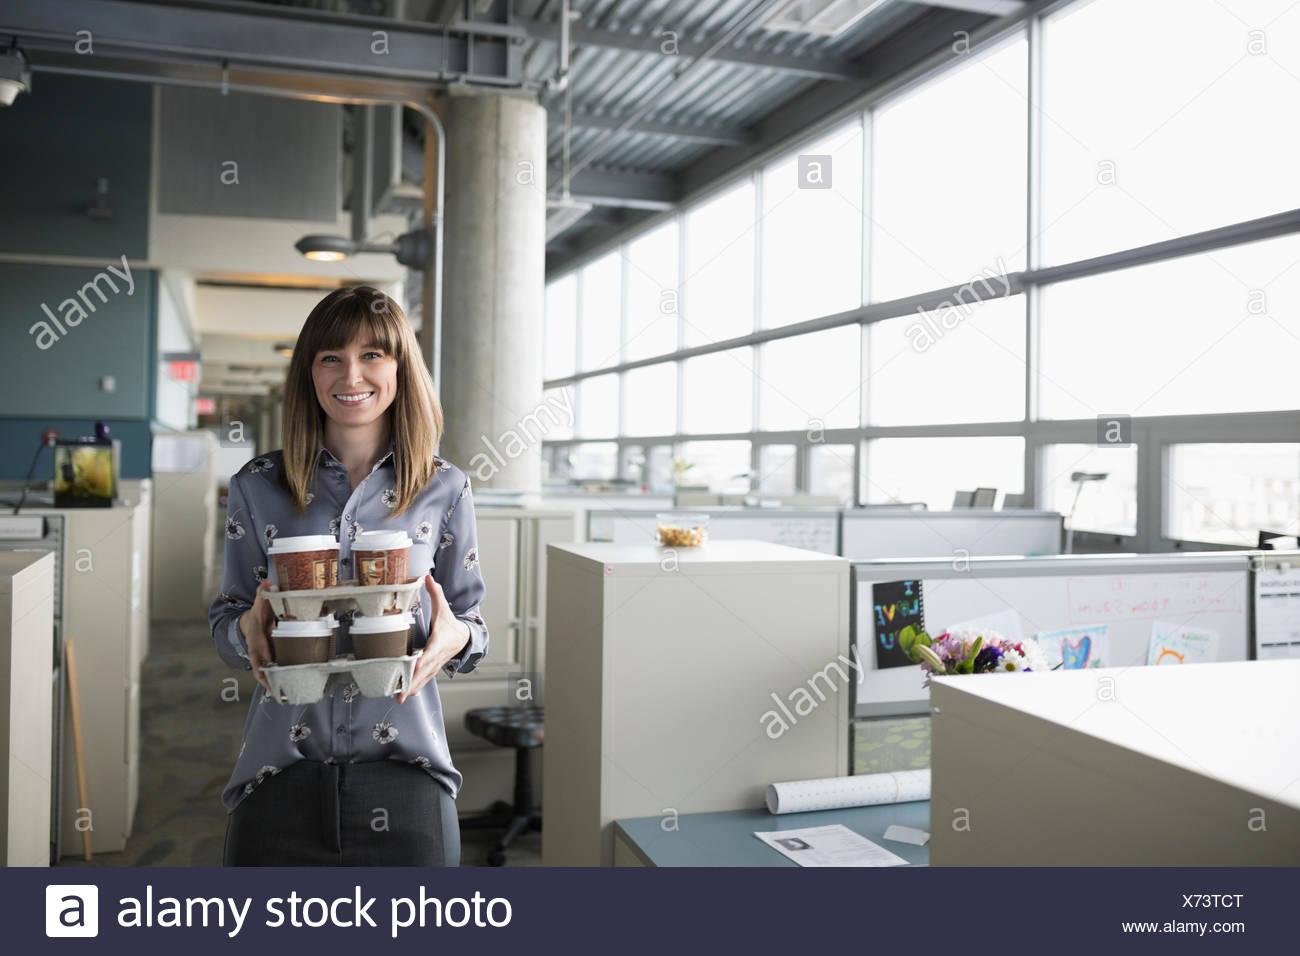 Porträt Lächeln, großzügige Geschäftsfrau, die Fächer der Kaffee im Büro Stockbild